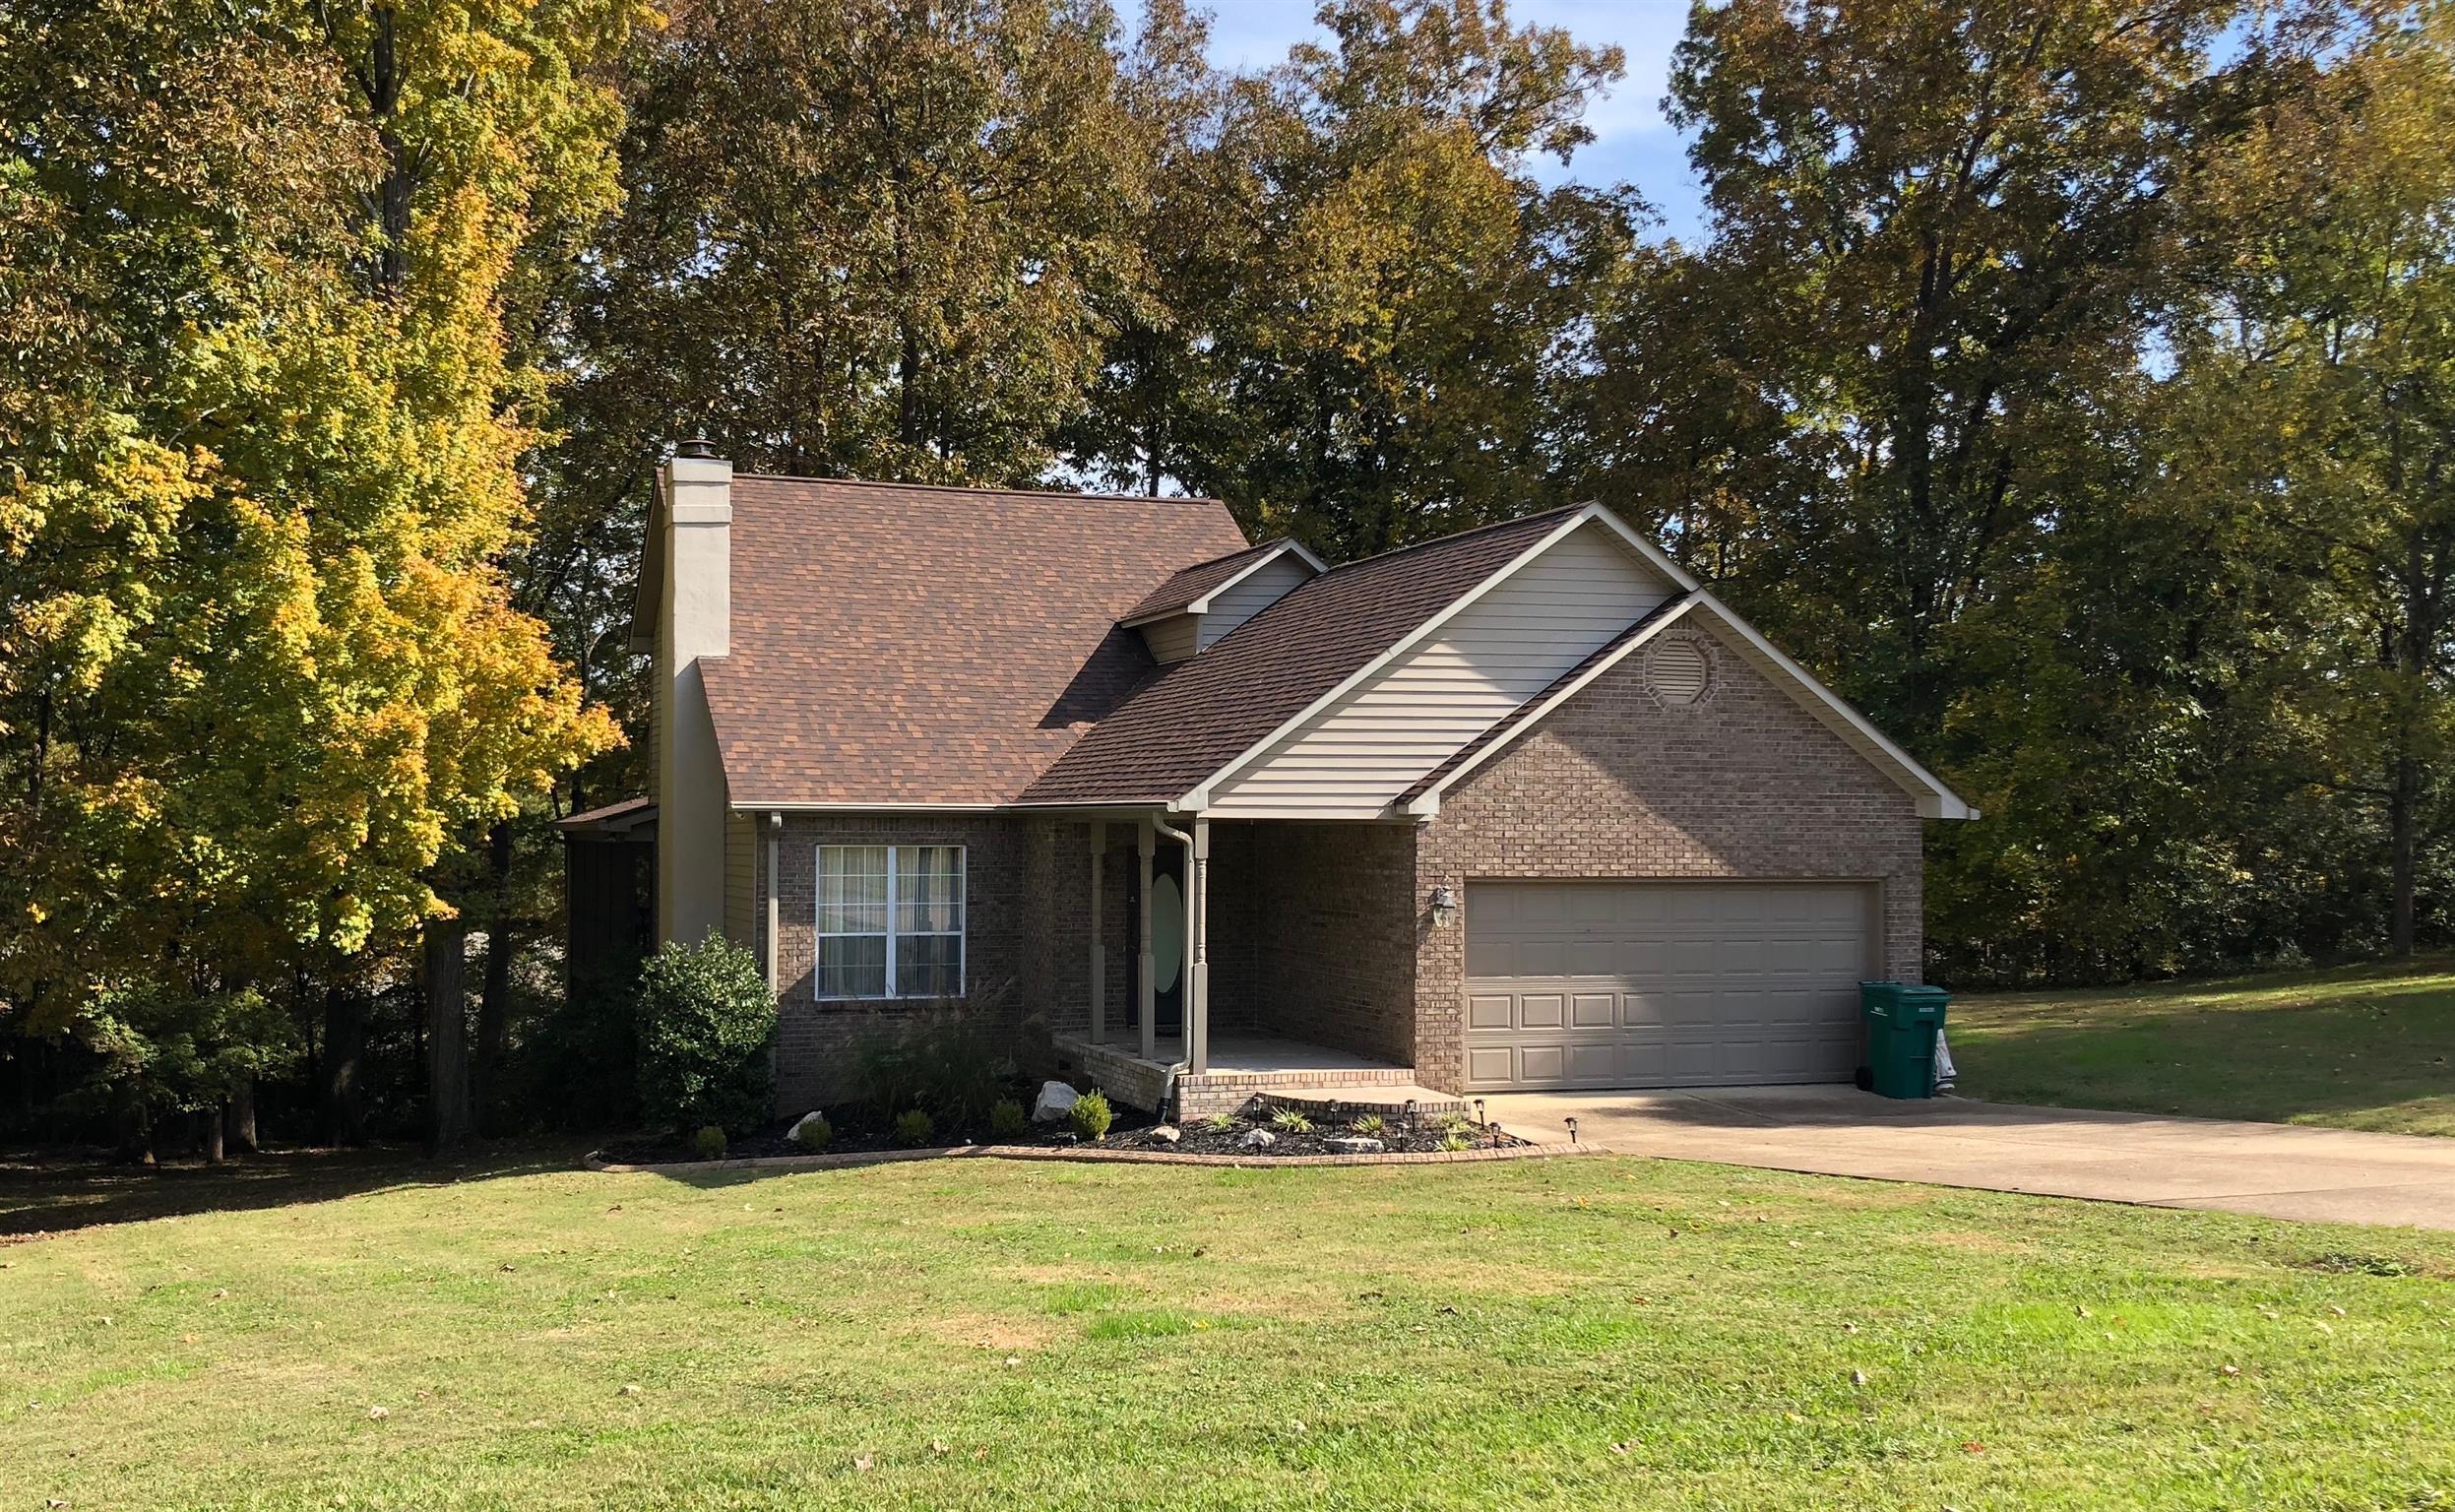 1200 White Dr, Lewisburg, TN 37091 - Lewisburg, TN real estate listing